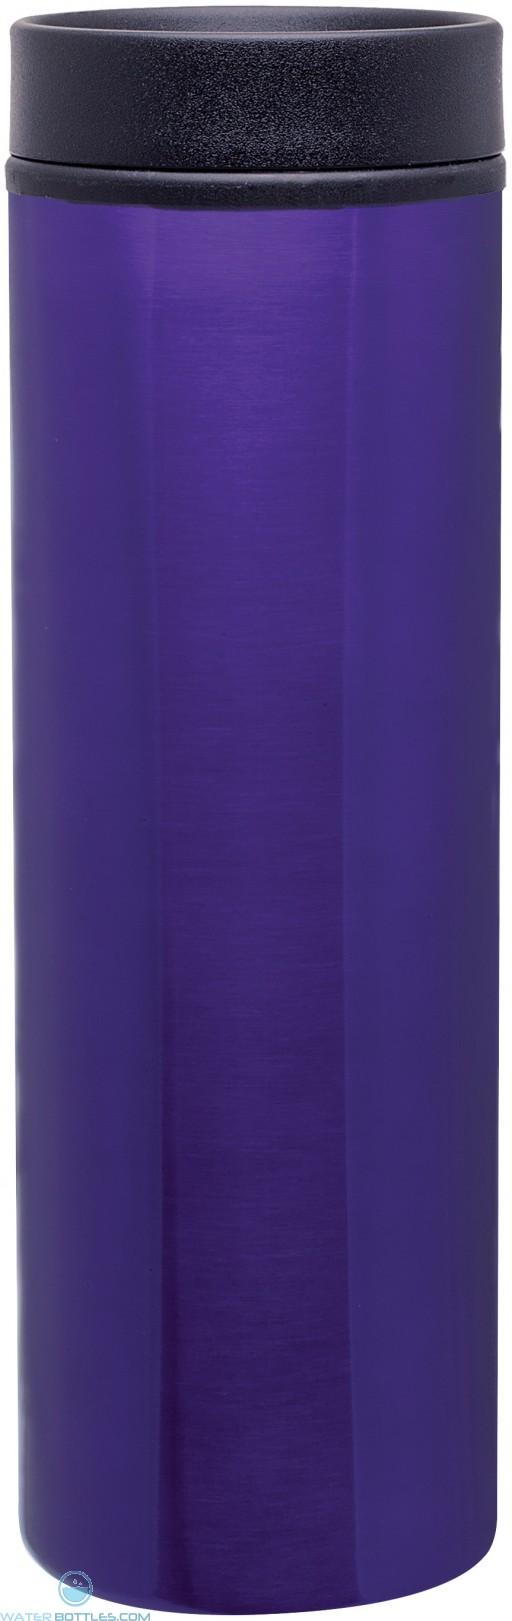 Montara Stainless Steel Tumblers | 16 oz - Purple